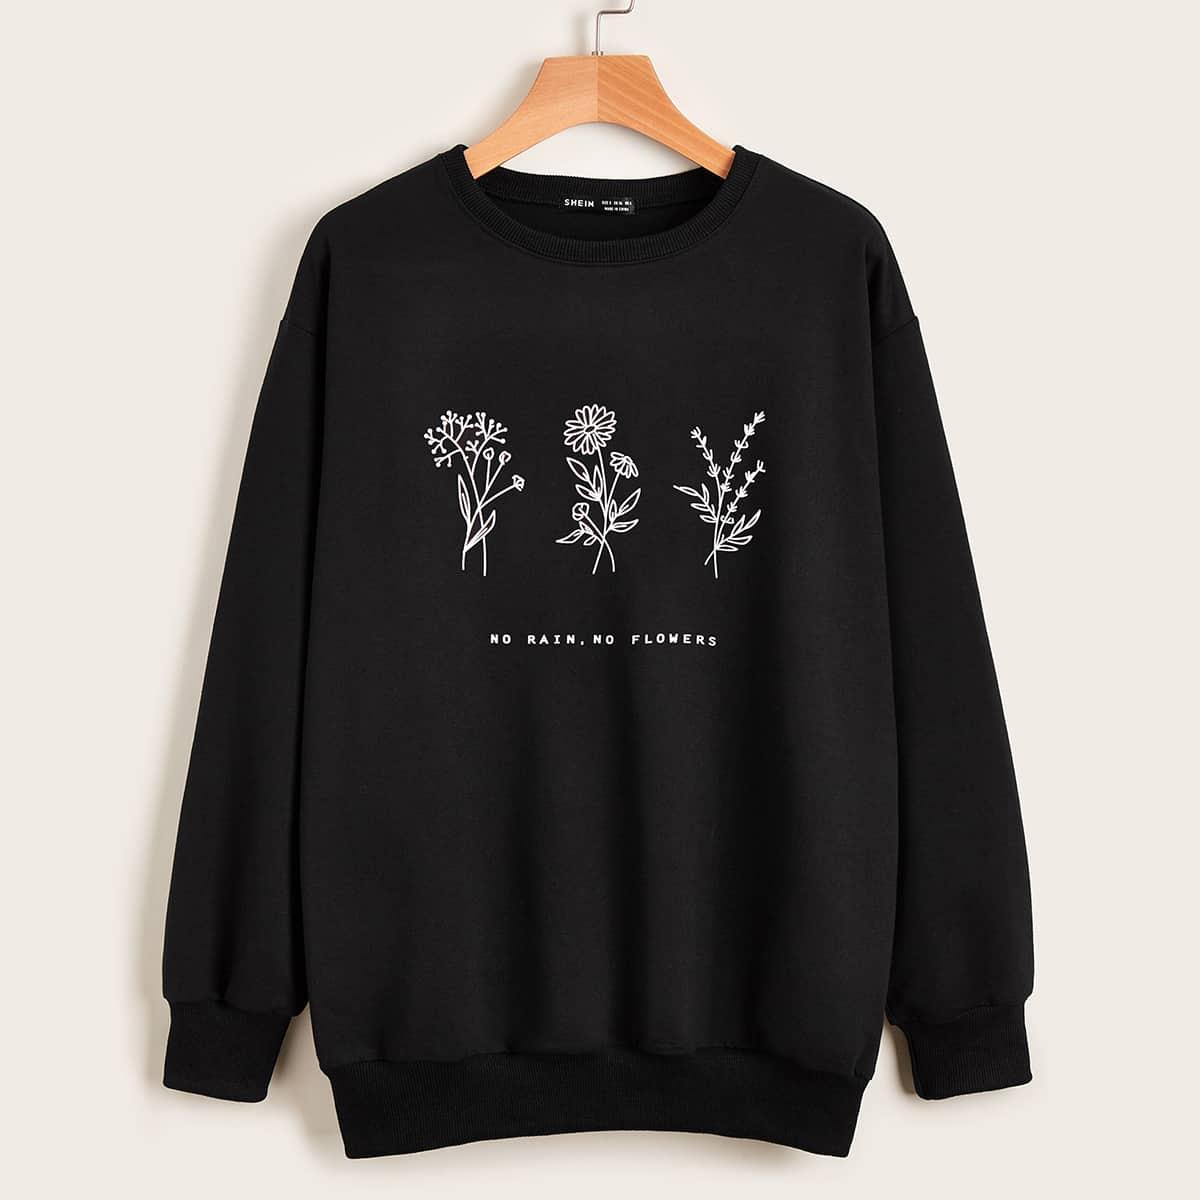 SHEIN / Floral & Slogan Graphic Drop Shoulder Sweatshirt